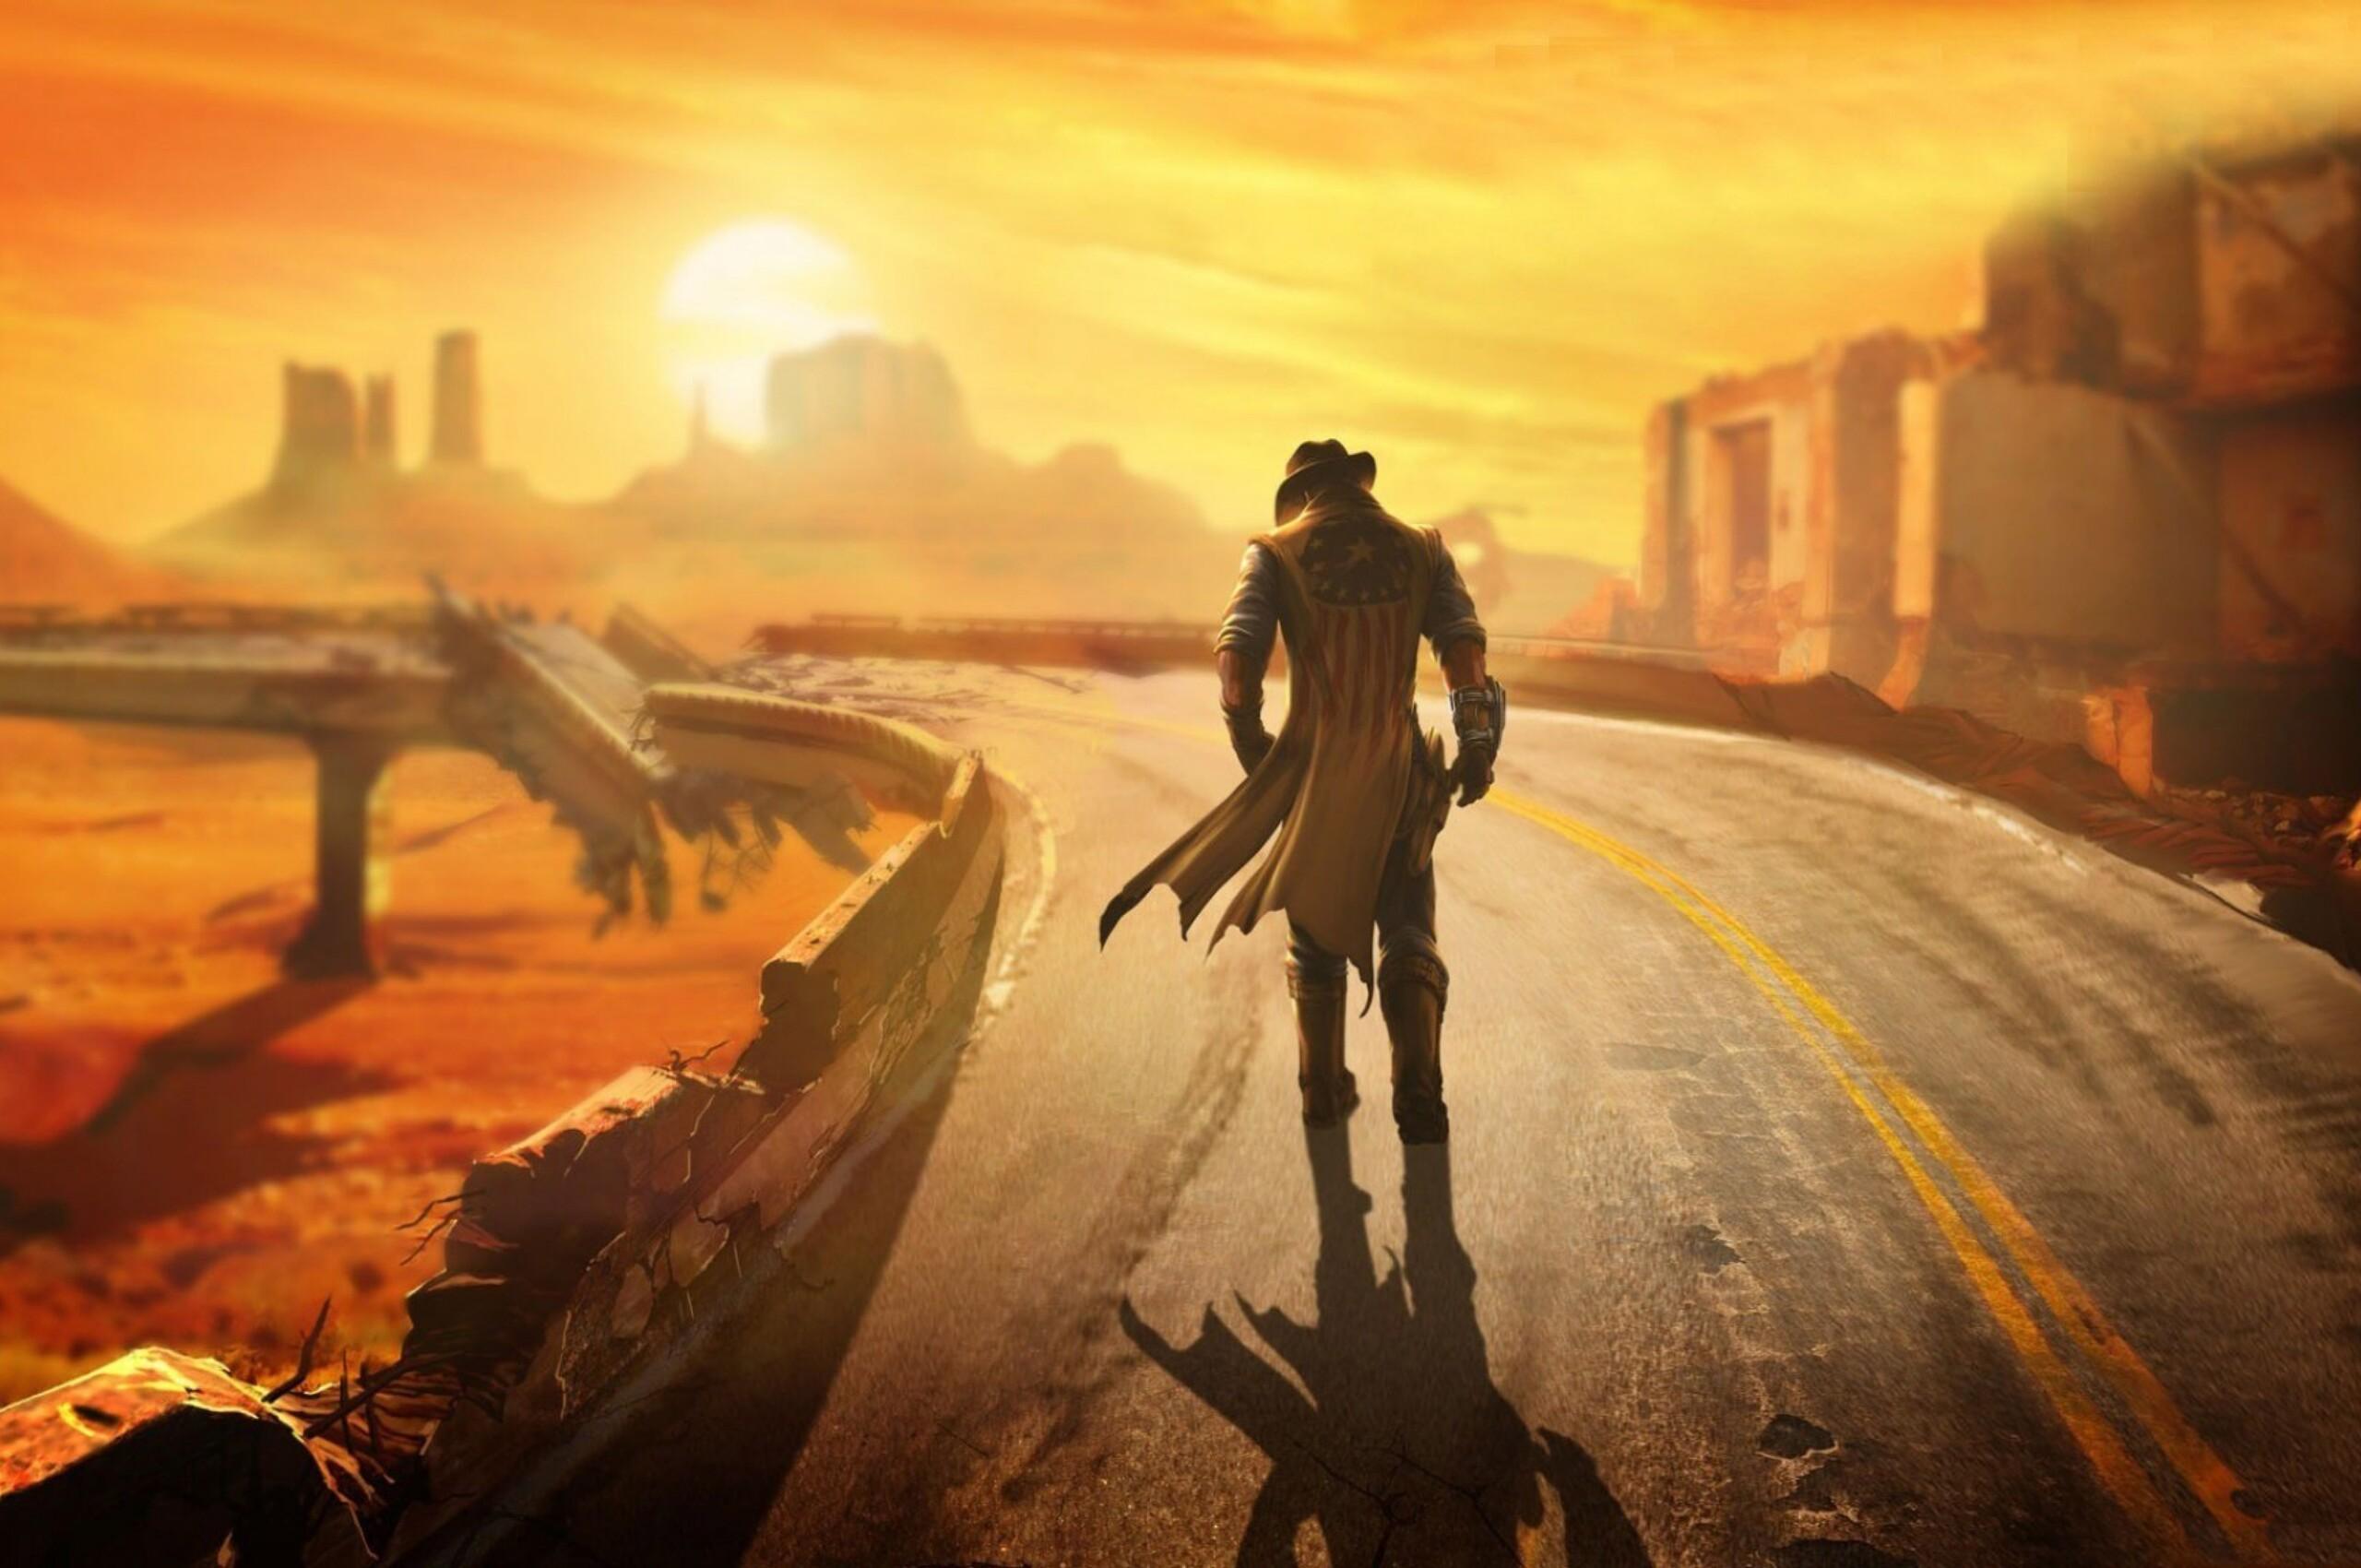 fallout-new-vega-4k-c6.jpg